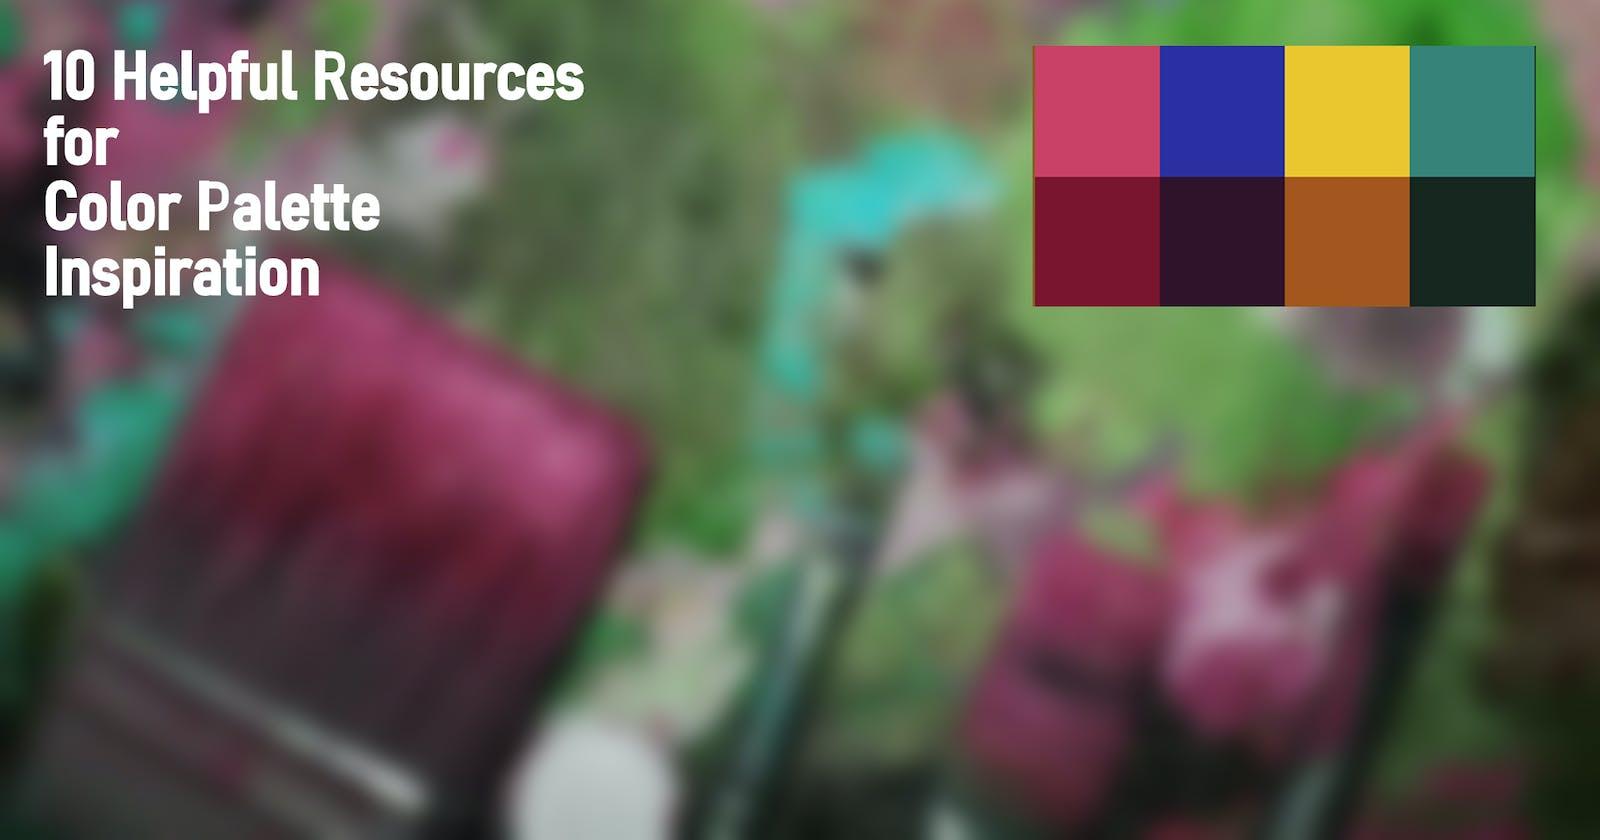 10 Wonderful Resources For Color Palette Inspiration